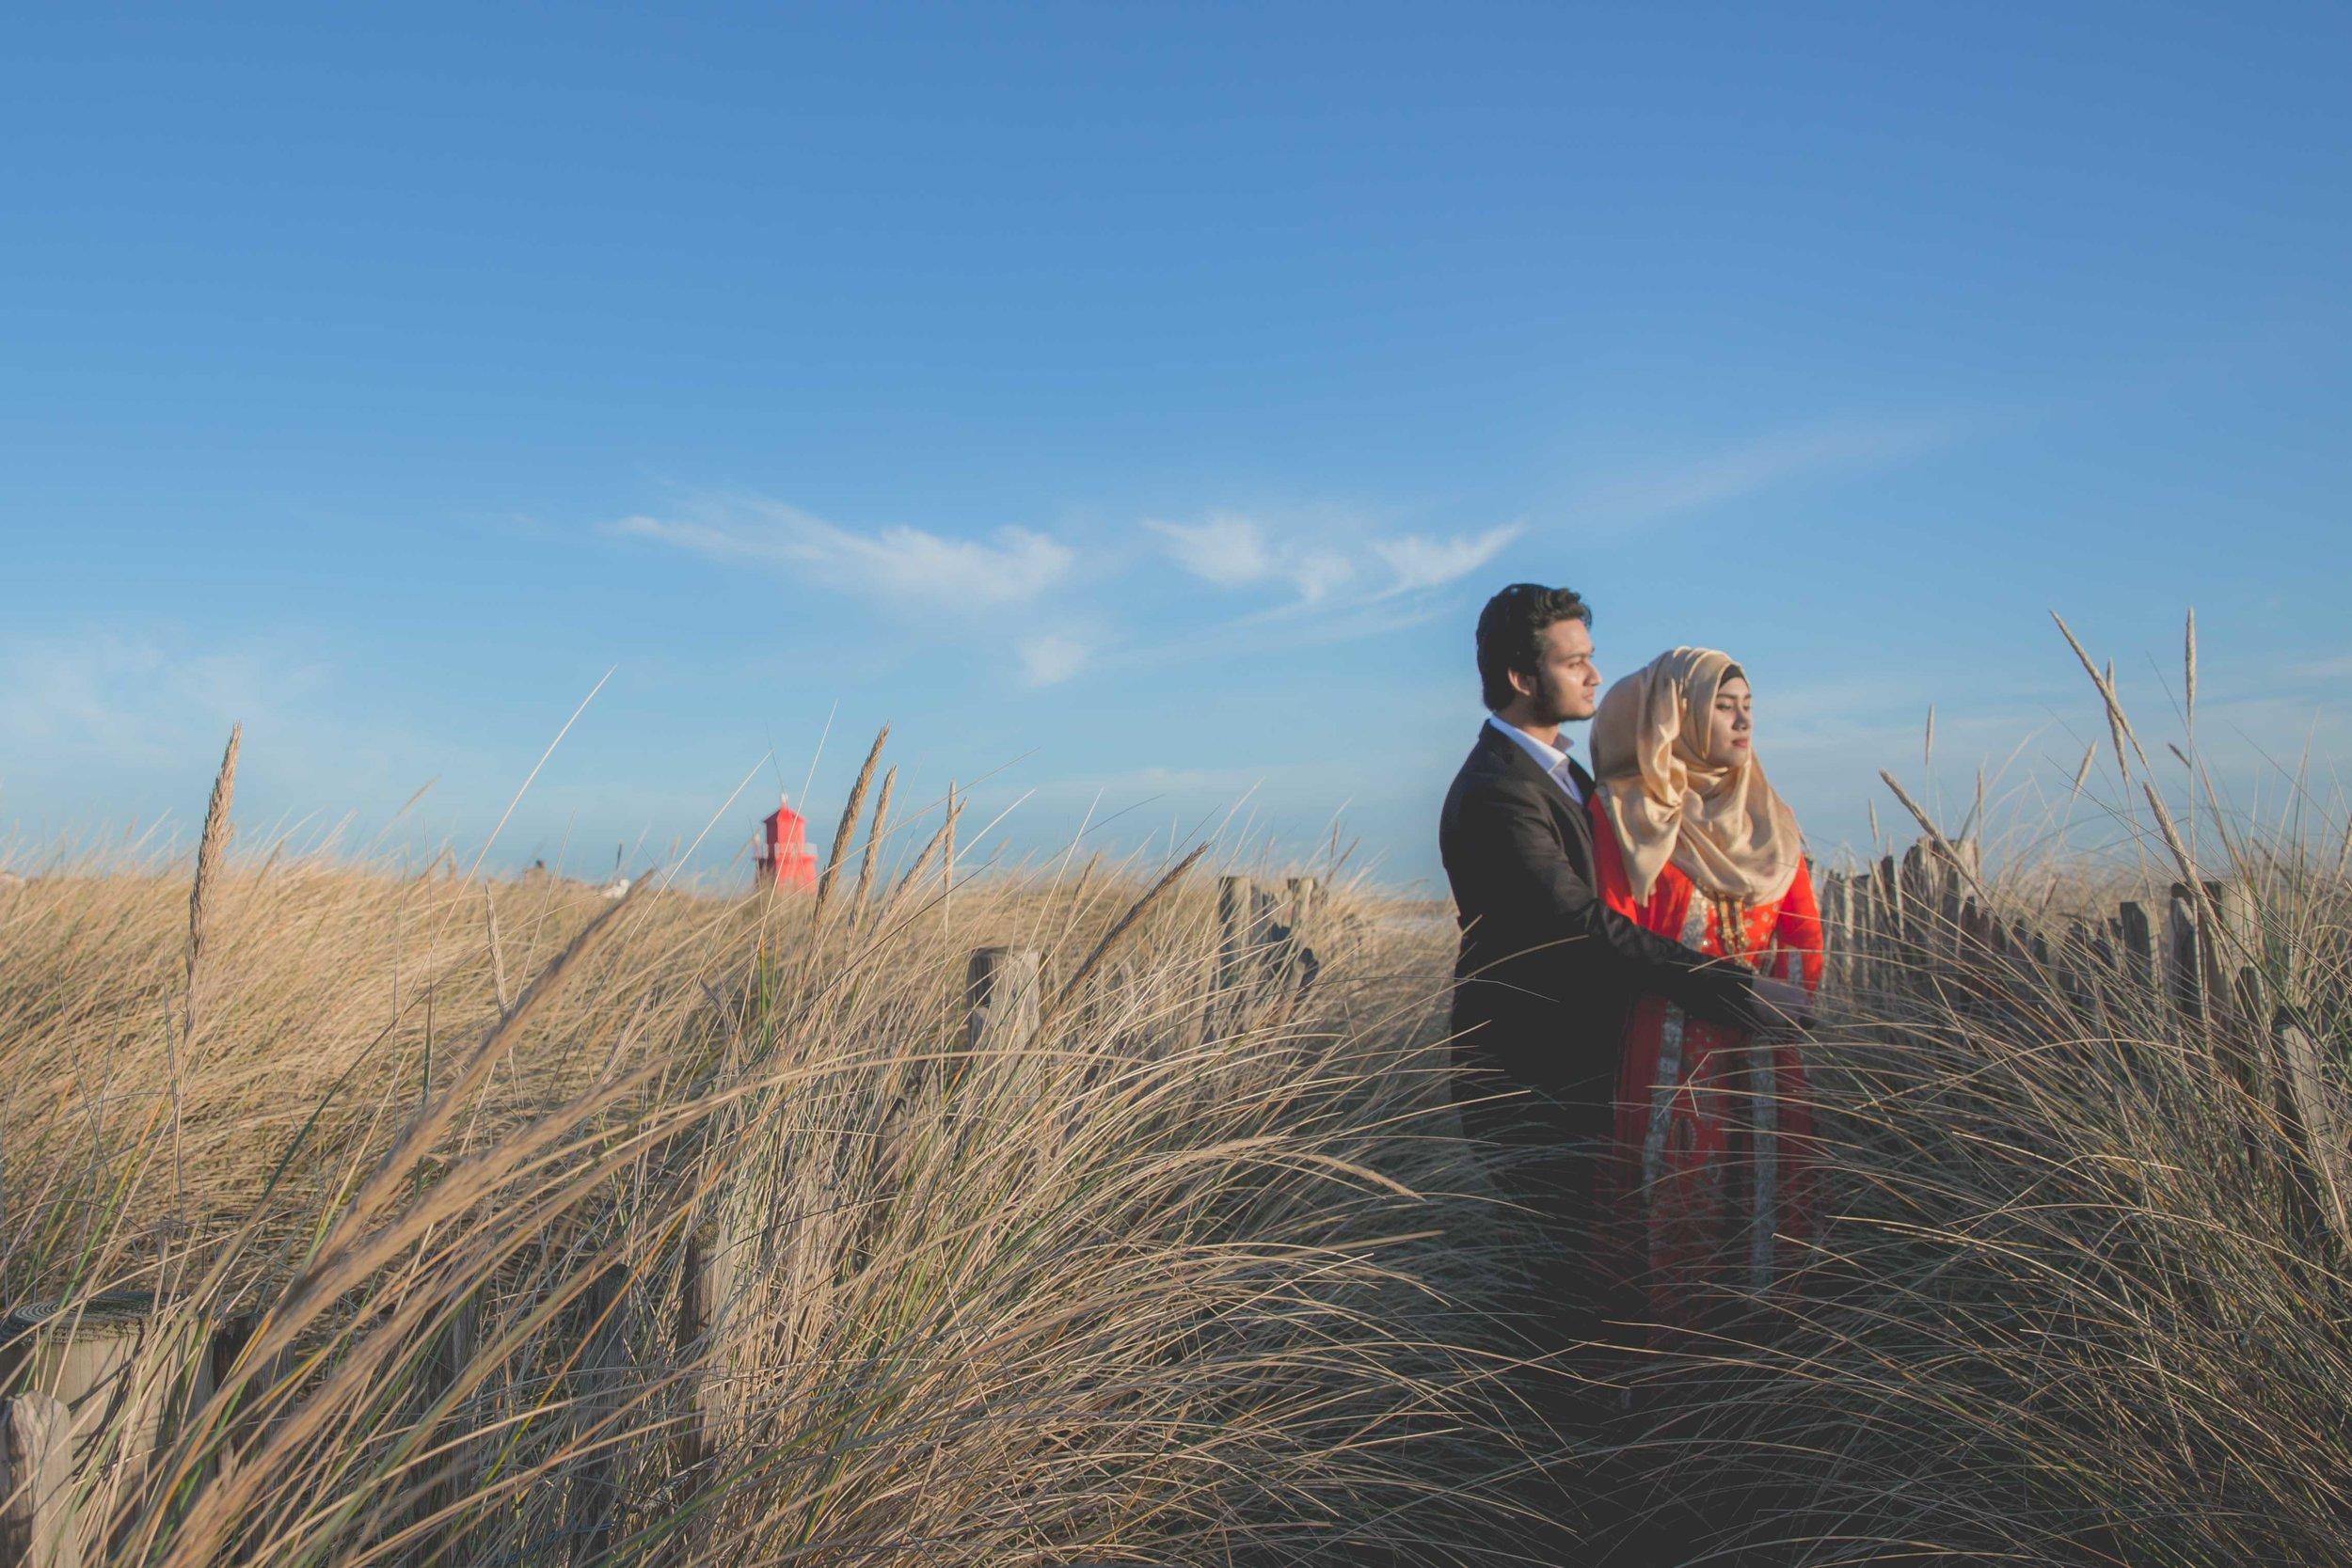 newcastle-beach-lighthouse-couple-prewedding-pre-wedding-shoot-asian-wedding-photographer-natalia-smith-photography-1.jpg